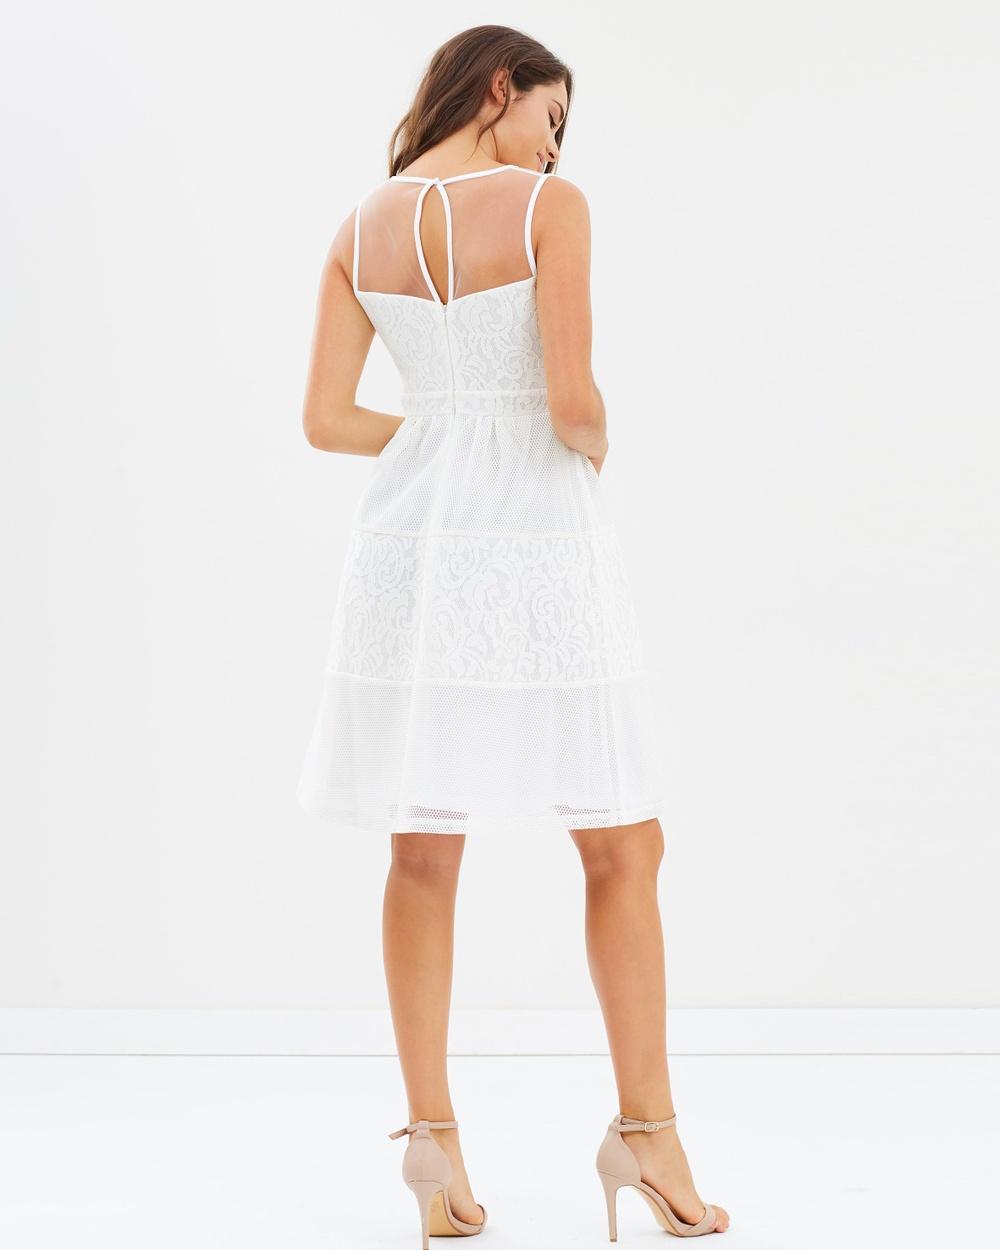 Dorothy Perkins Lace Mix Prom Dress Dresses Ivory Lace Mix Prom Dress